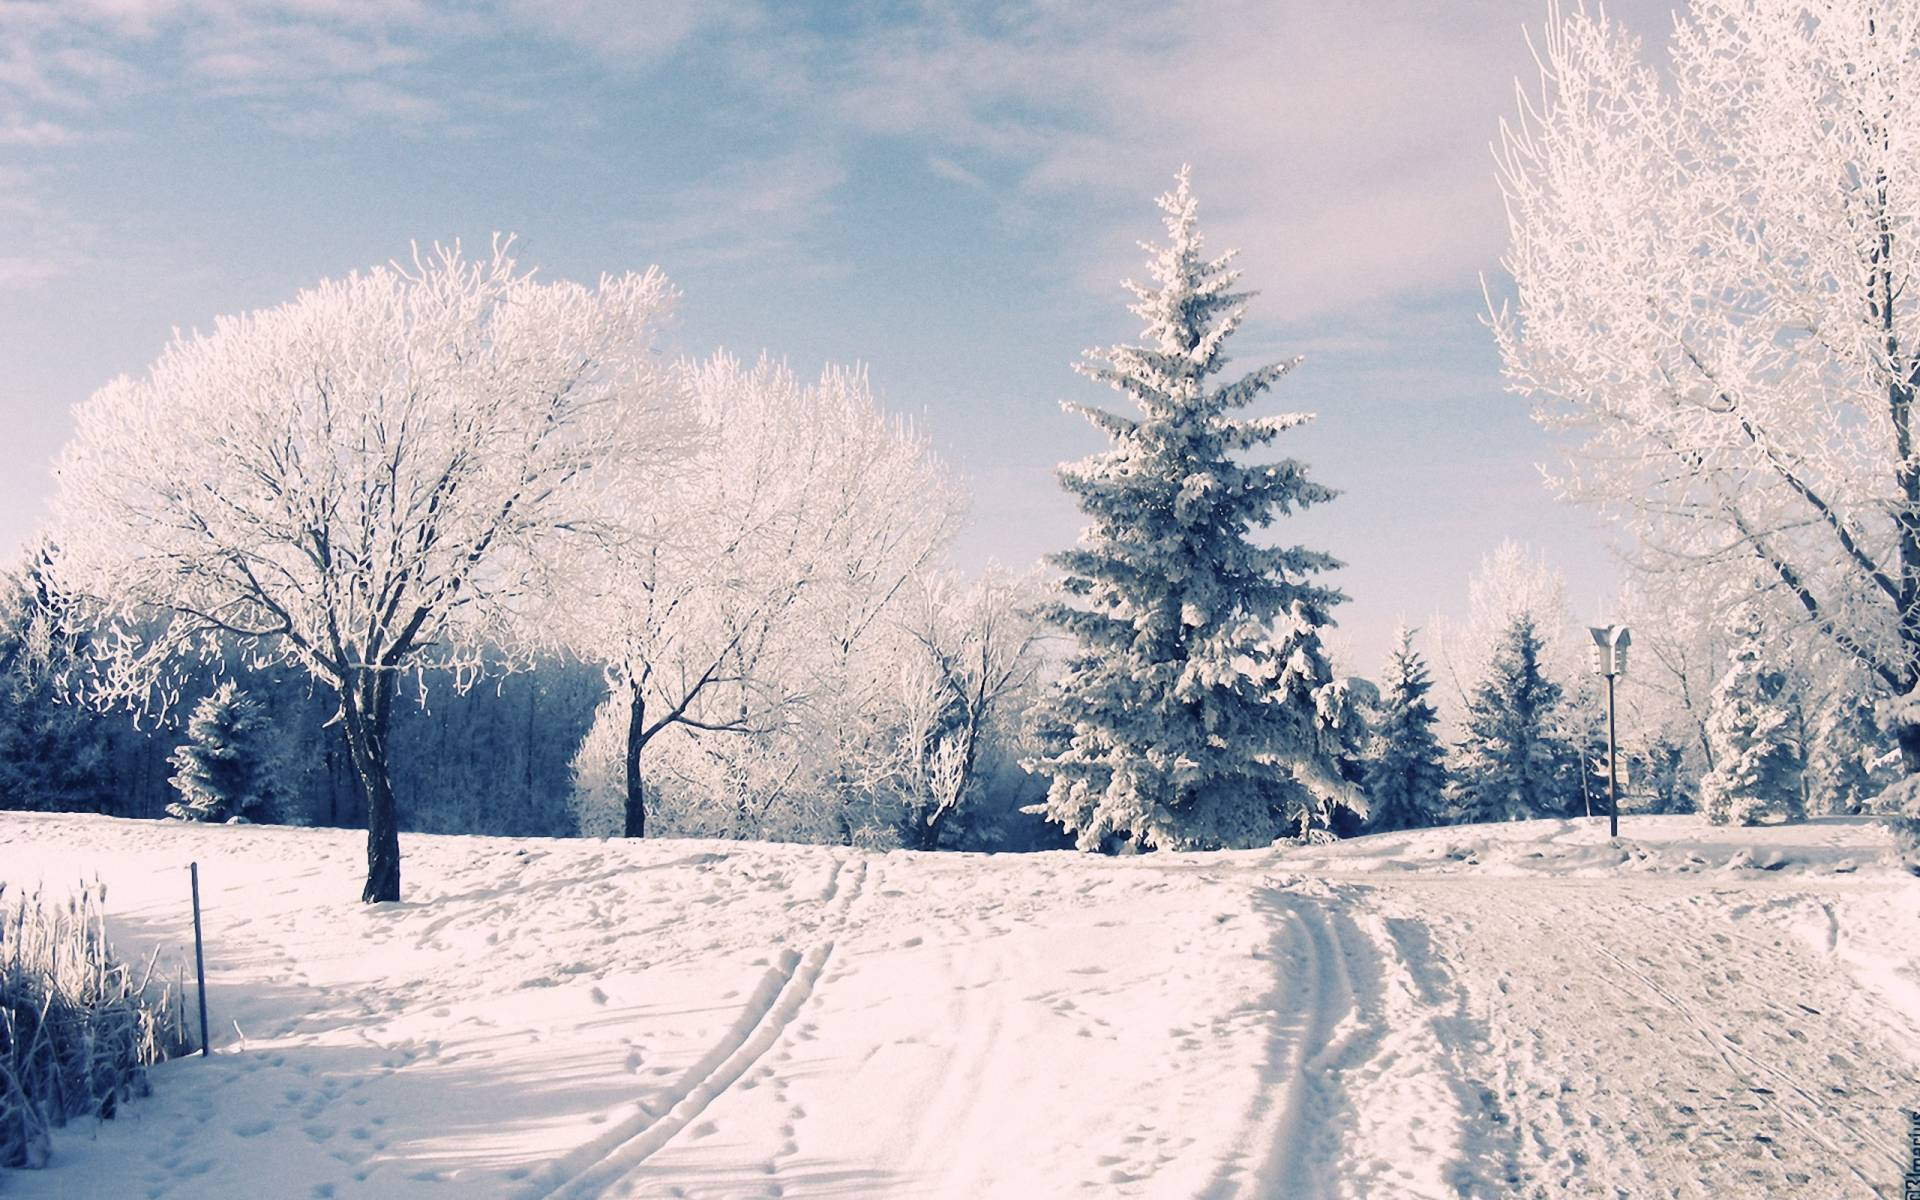 Winter Wonderland Backgrounds 1920x1200